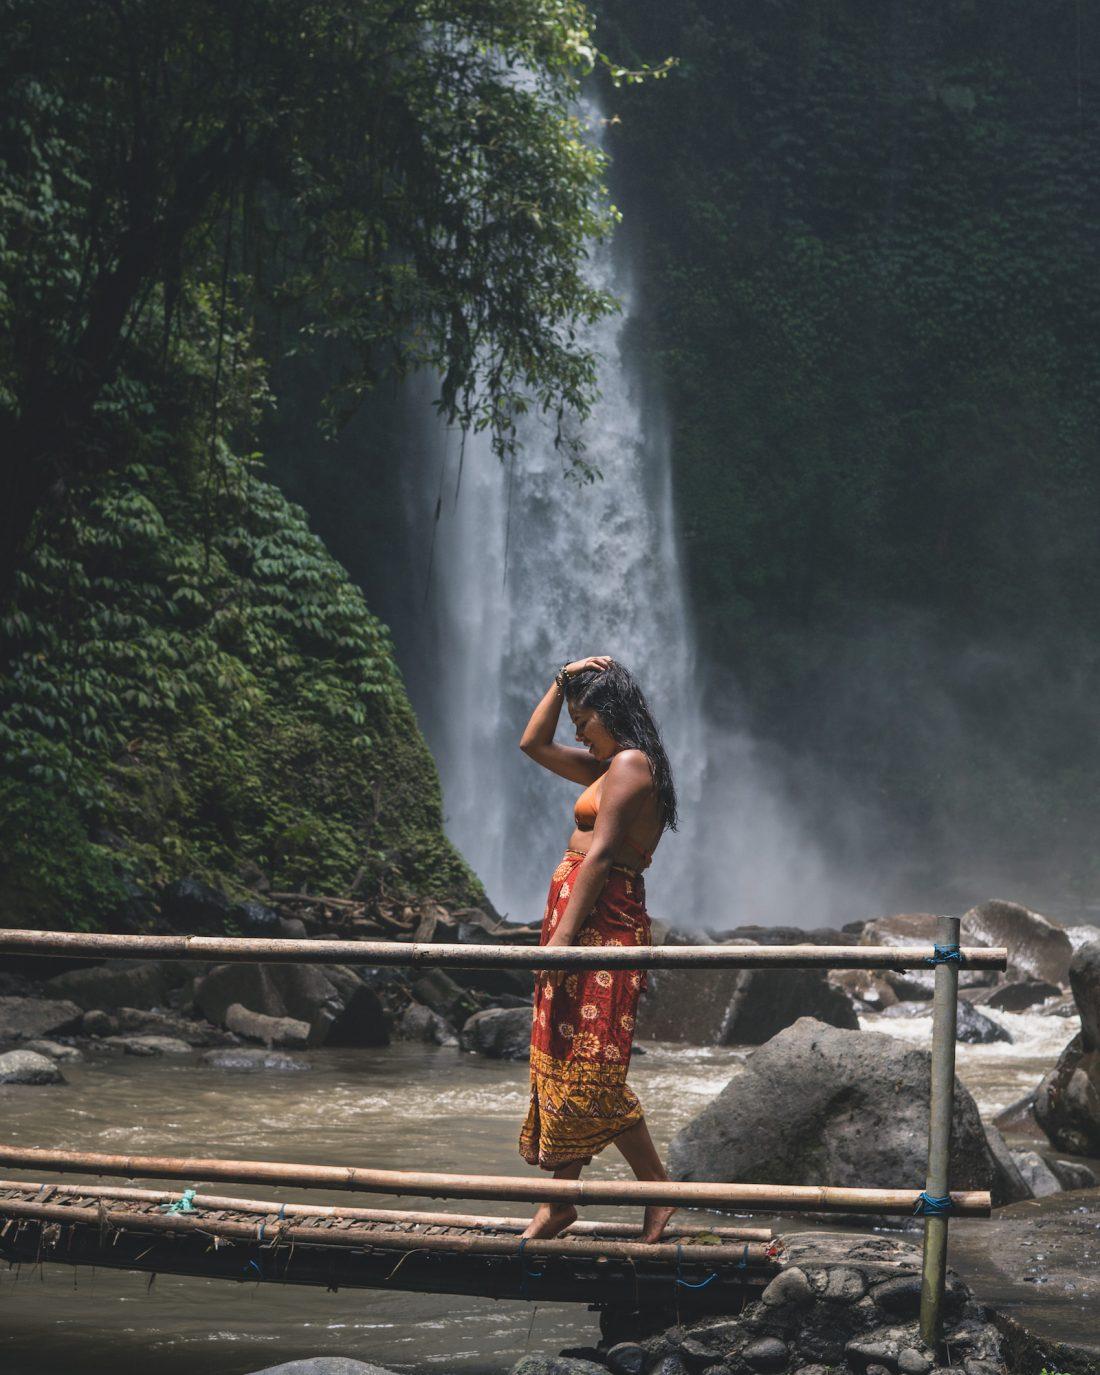 Nungnung Bali Waterfalls